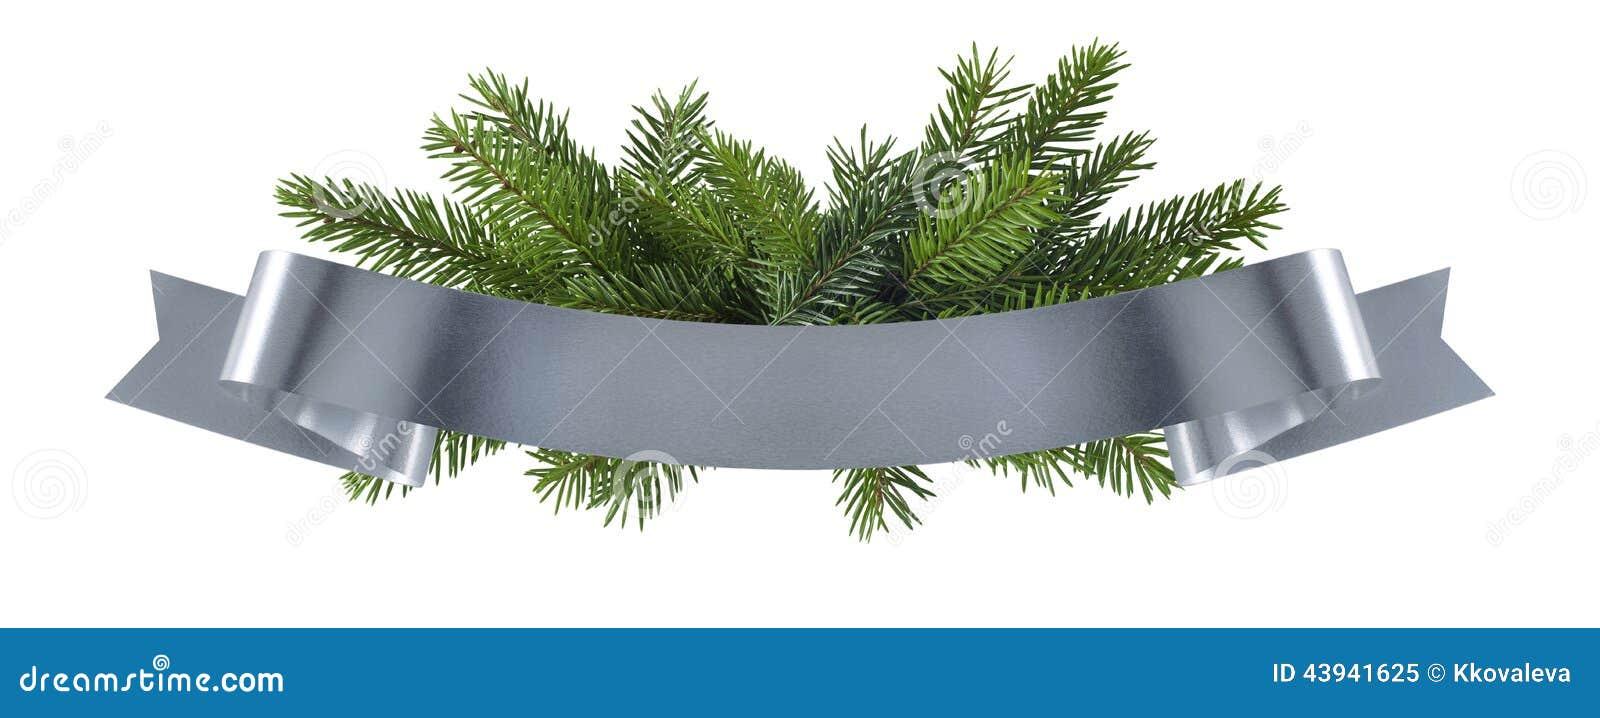 simple christmas silver decoration element - Simple Christmas Menu